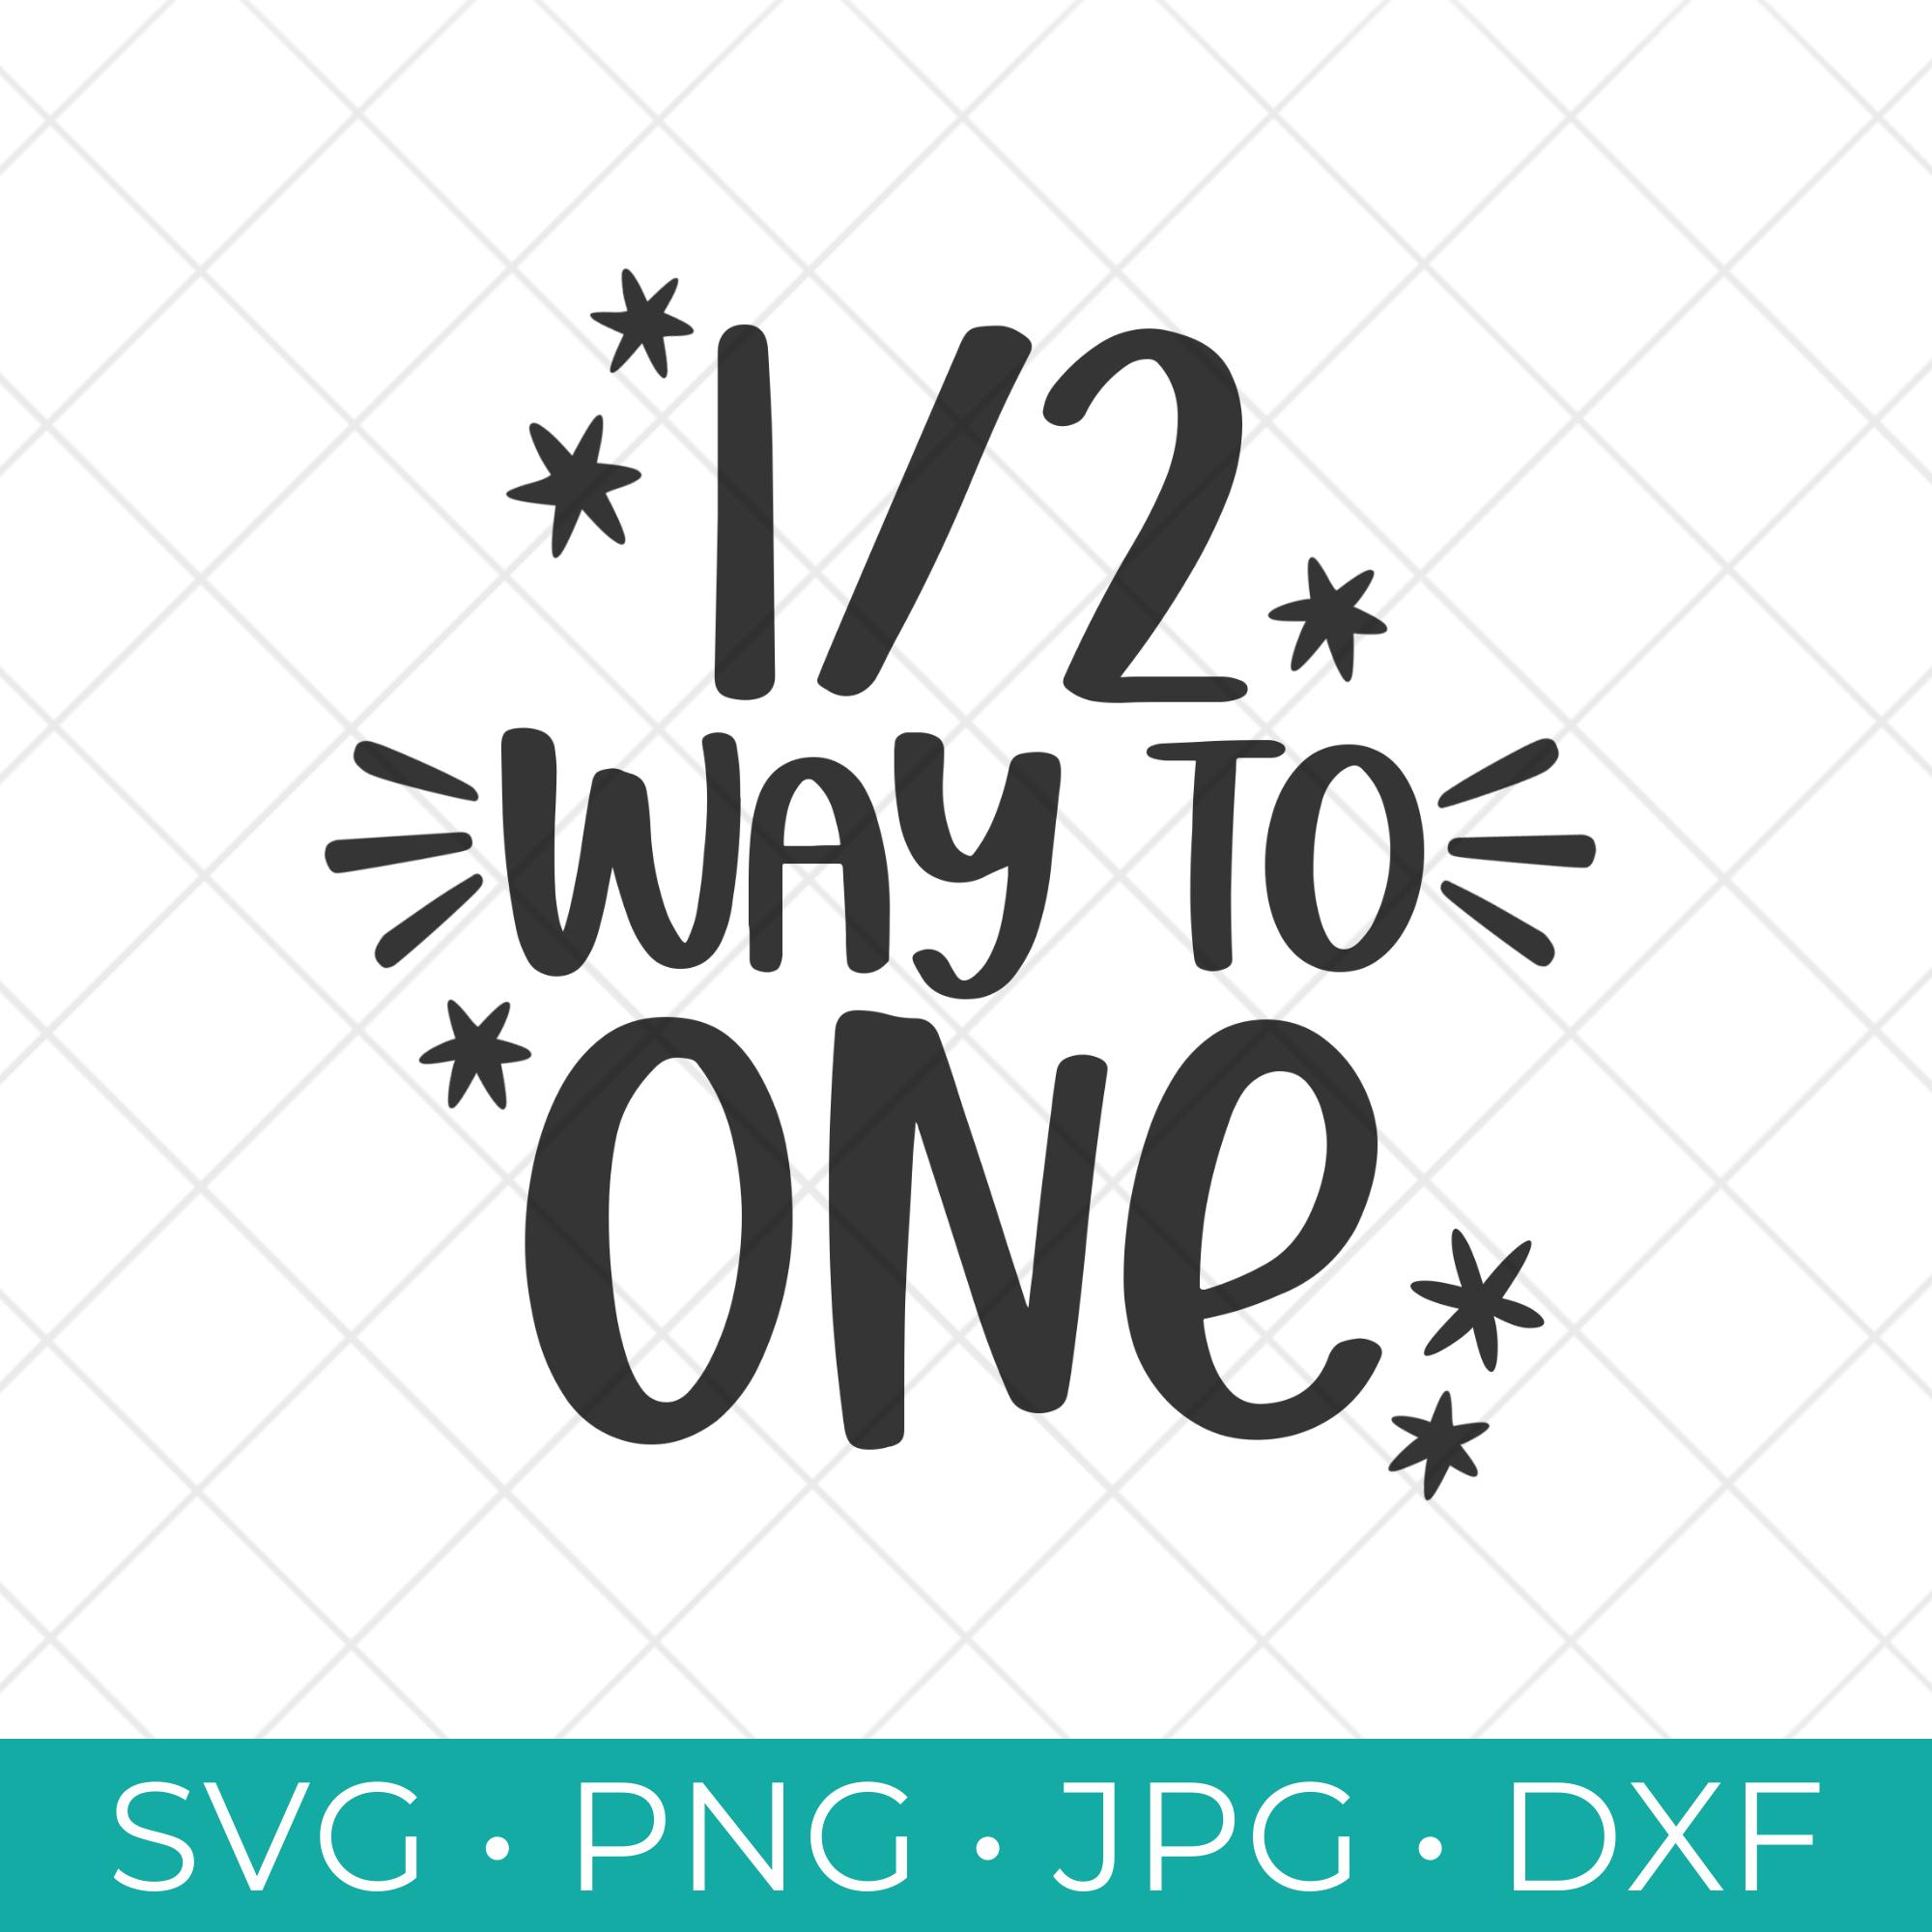 Half Way to One Half Birthday SVG Cut File